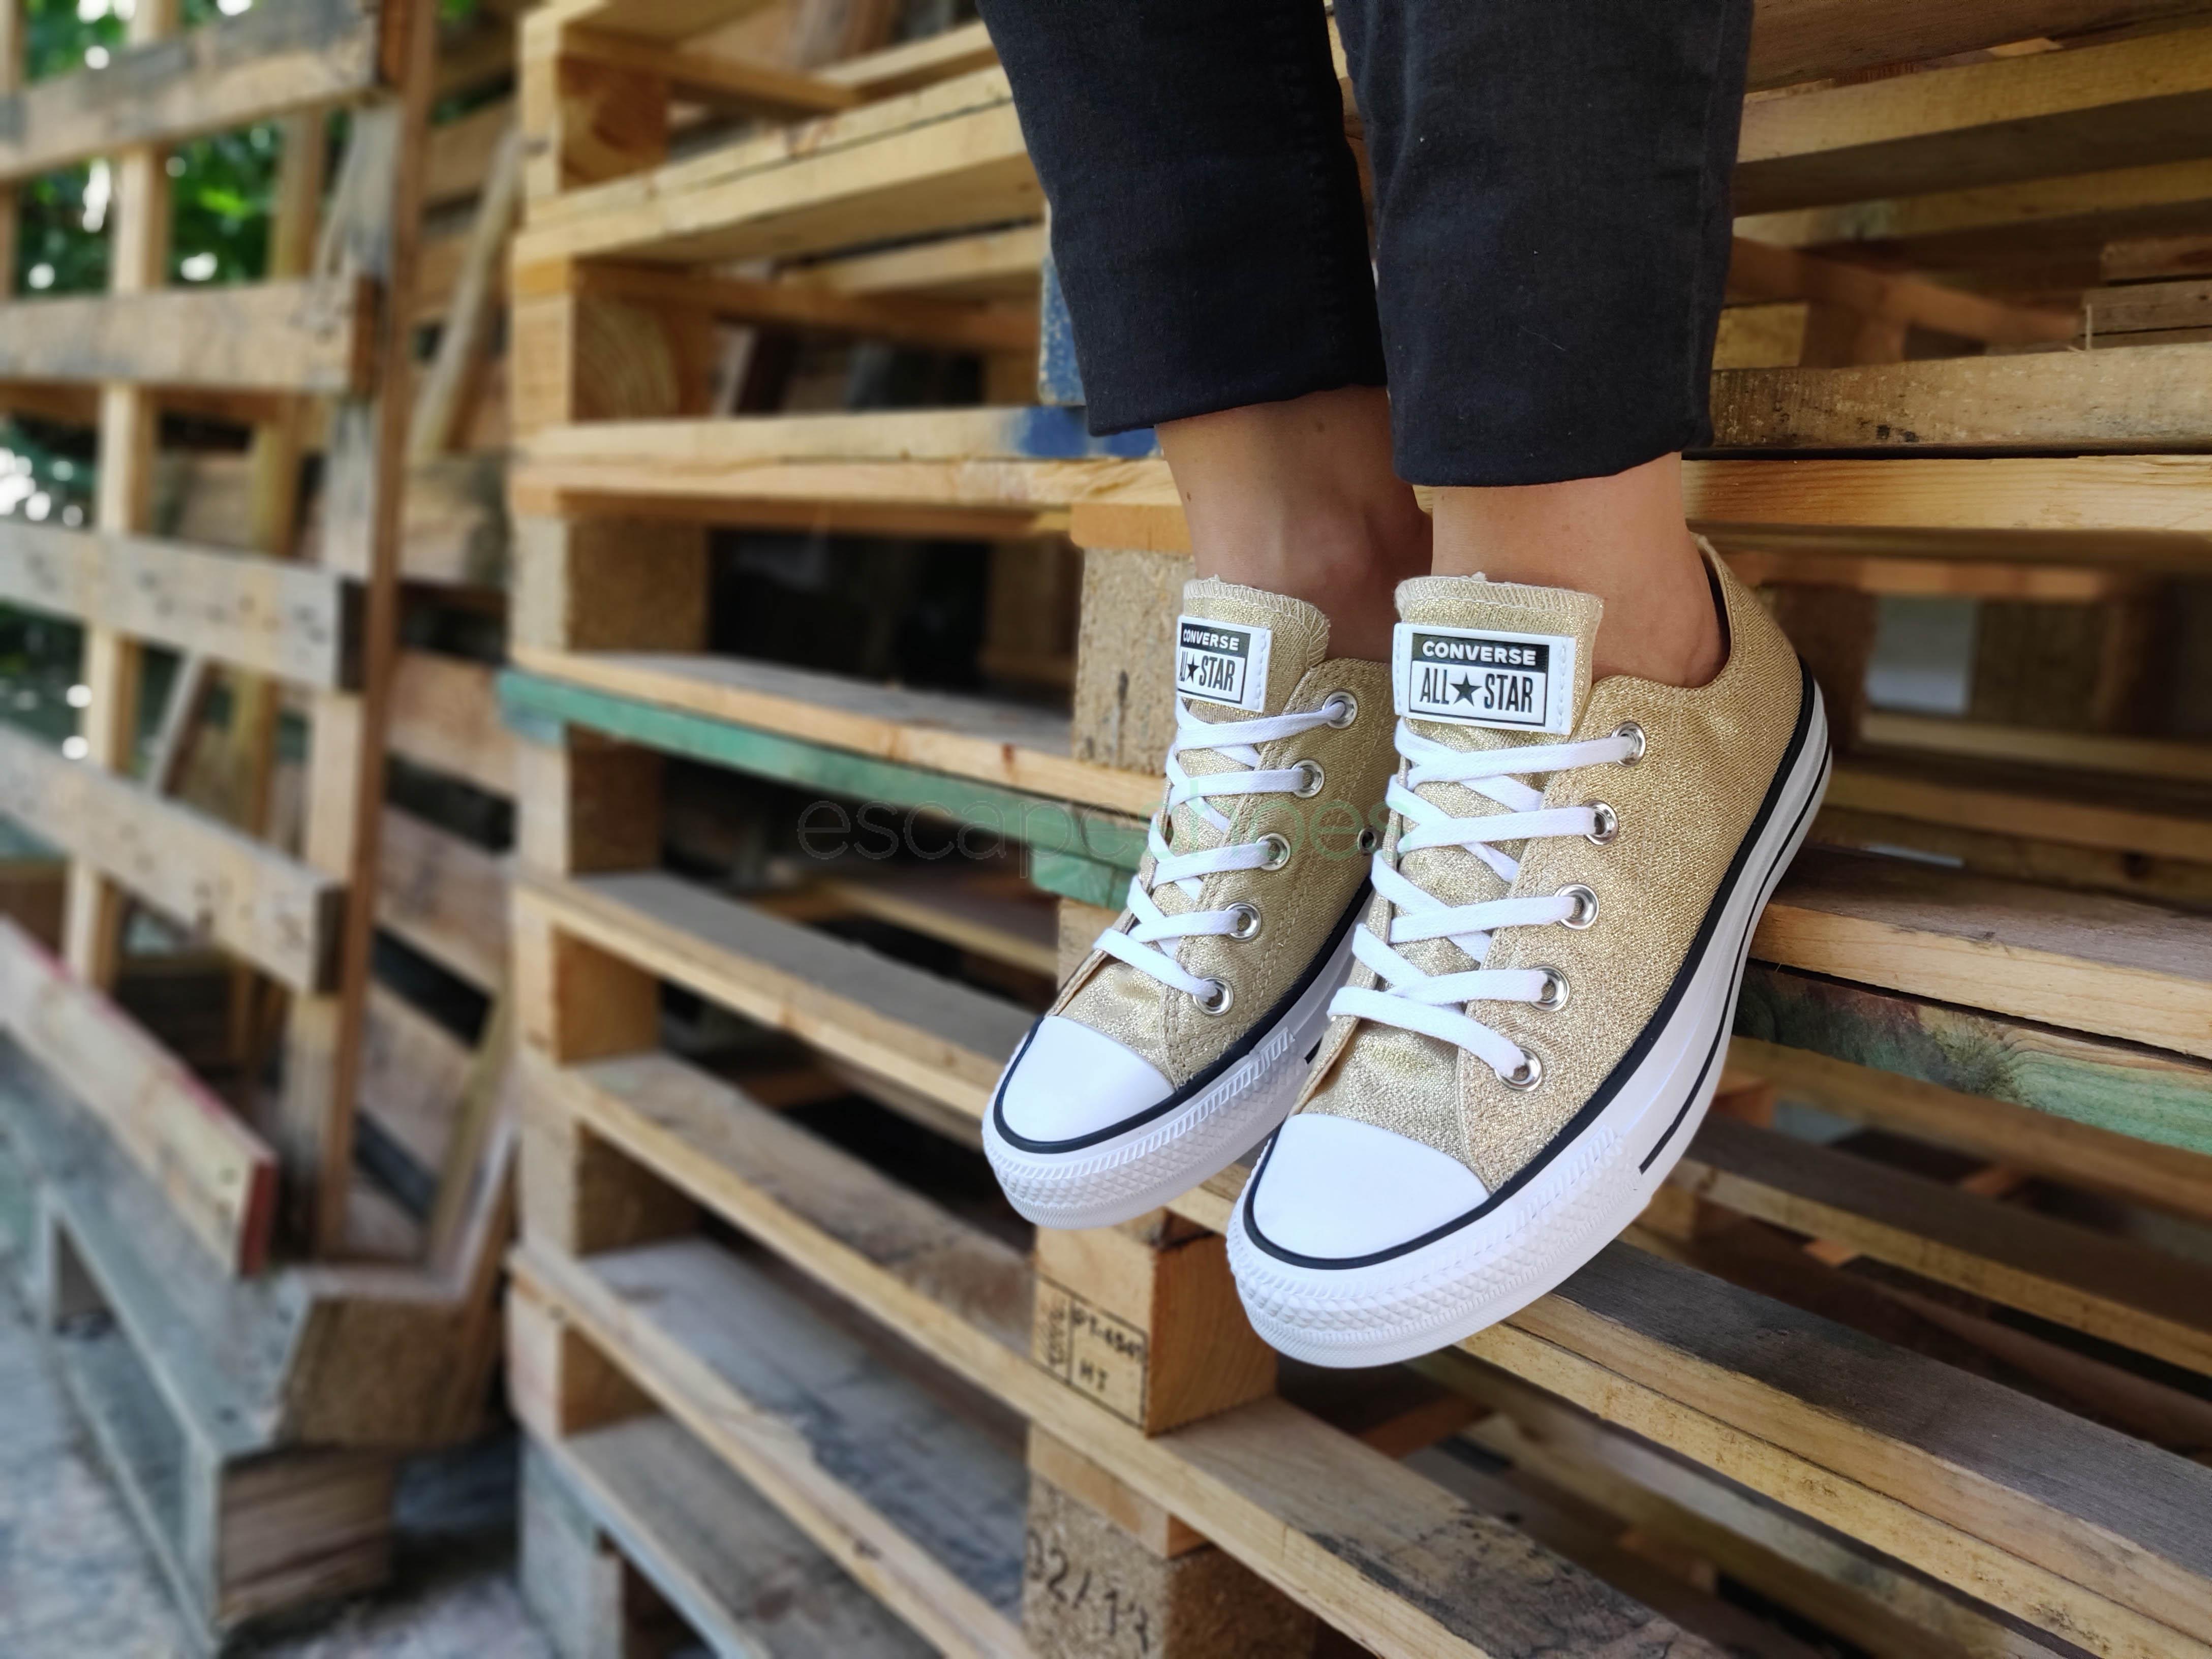 calzado converse chuck taylor all stars ox